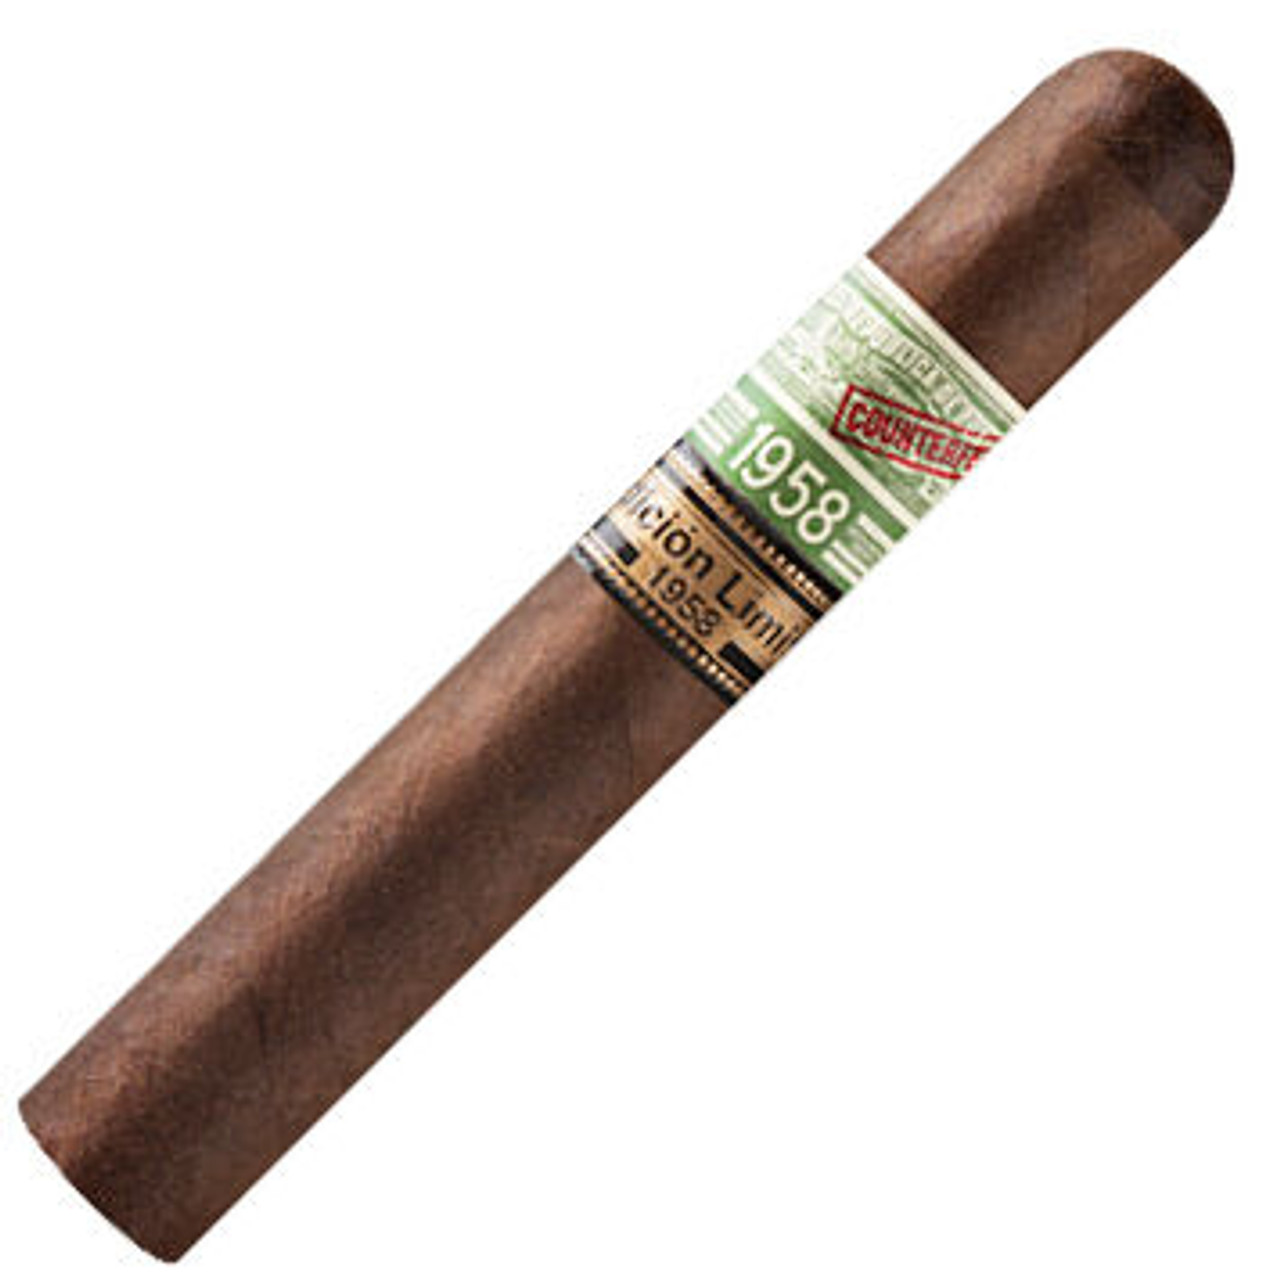 Genuine Pre-Embargo C.C. Edicion Limitada 1958 Sesenta Cigars - 6 x 60 (Cedar Chest of 25)